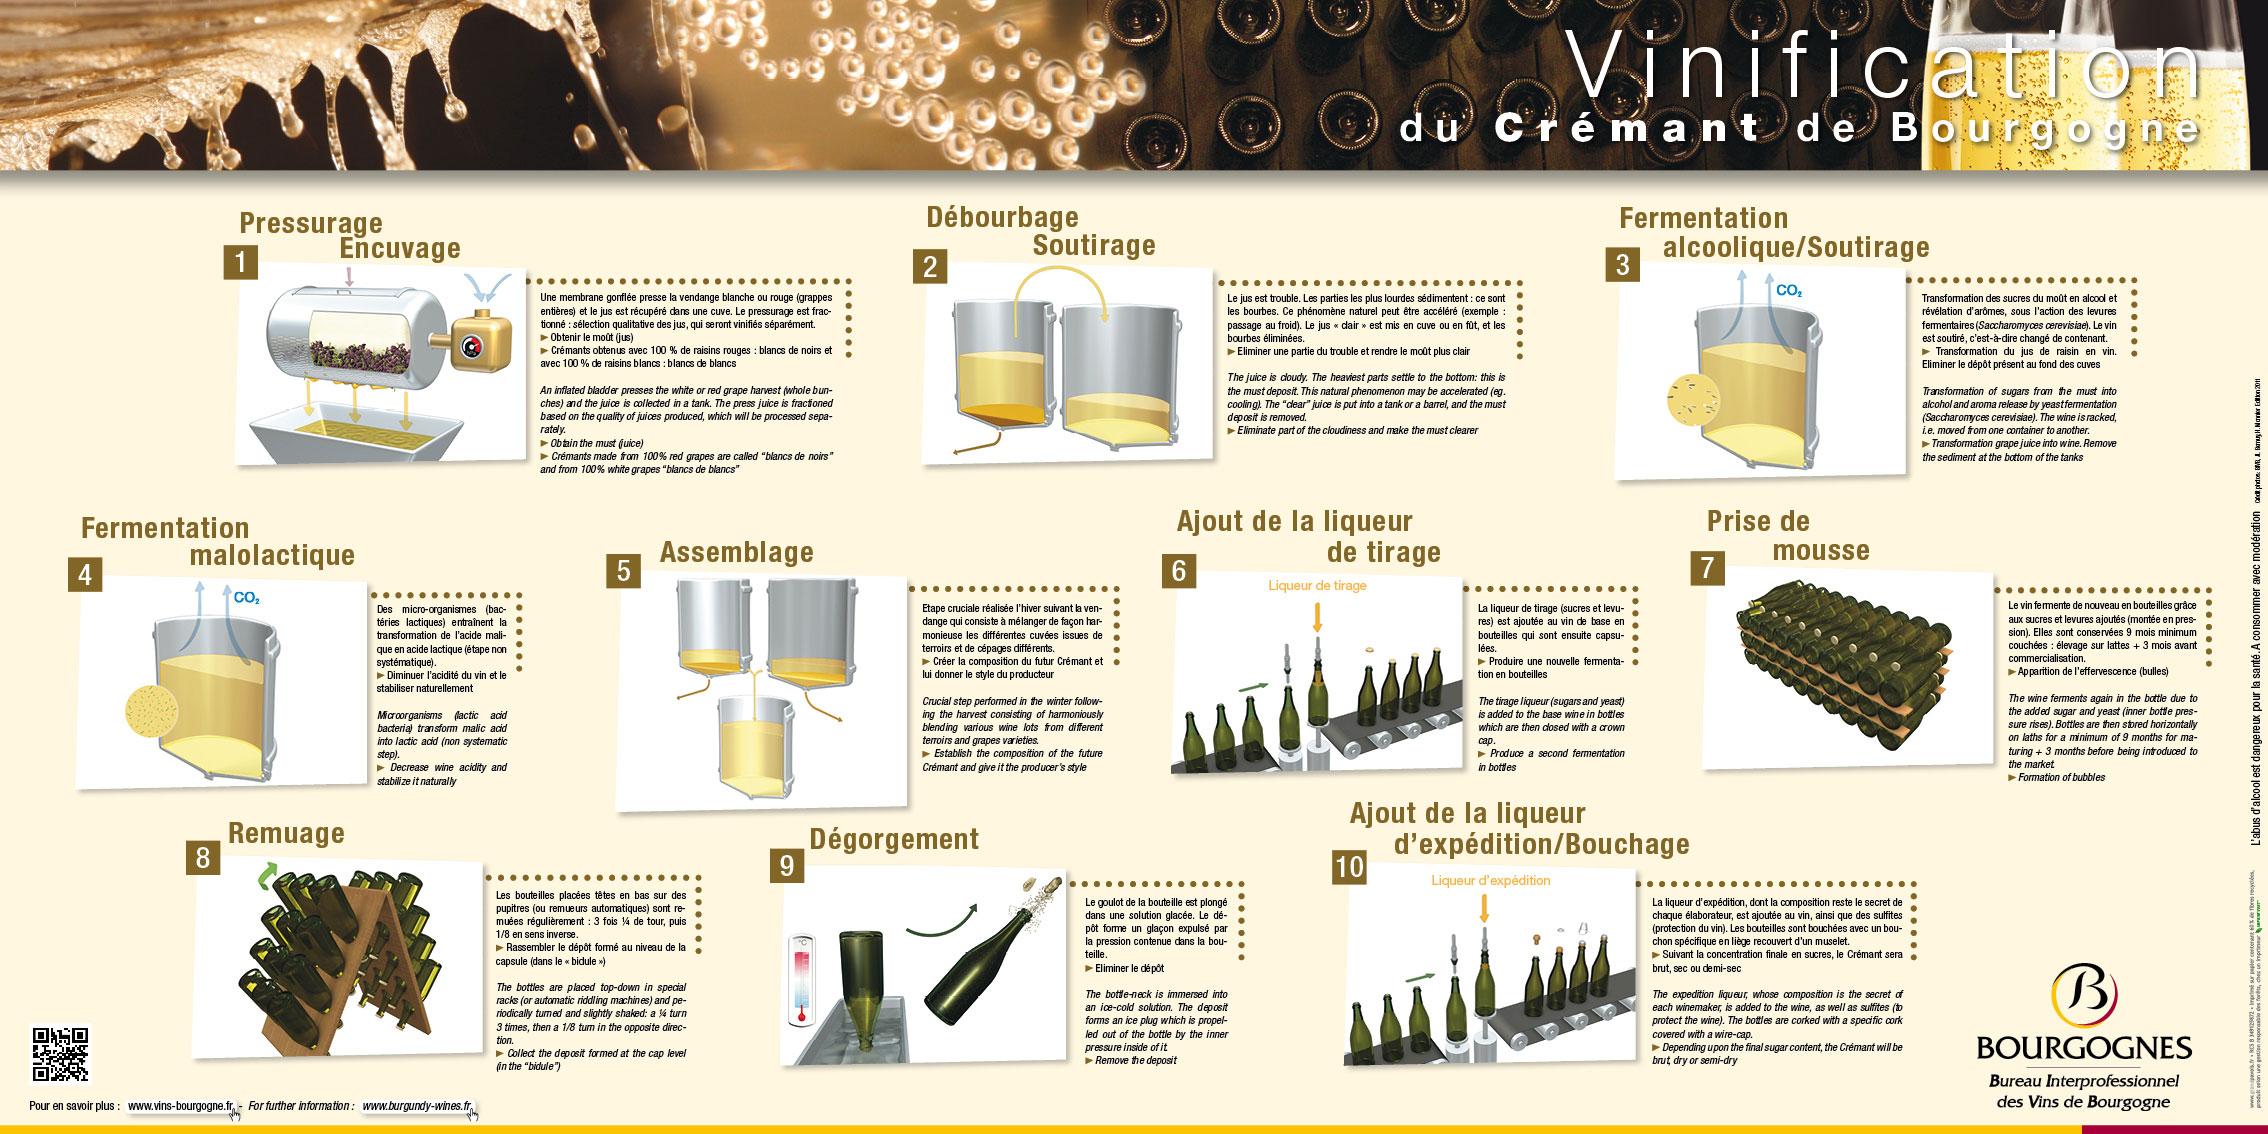 vinification